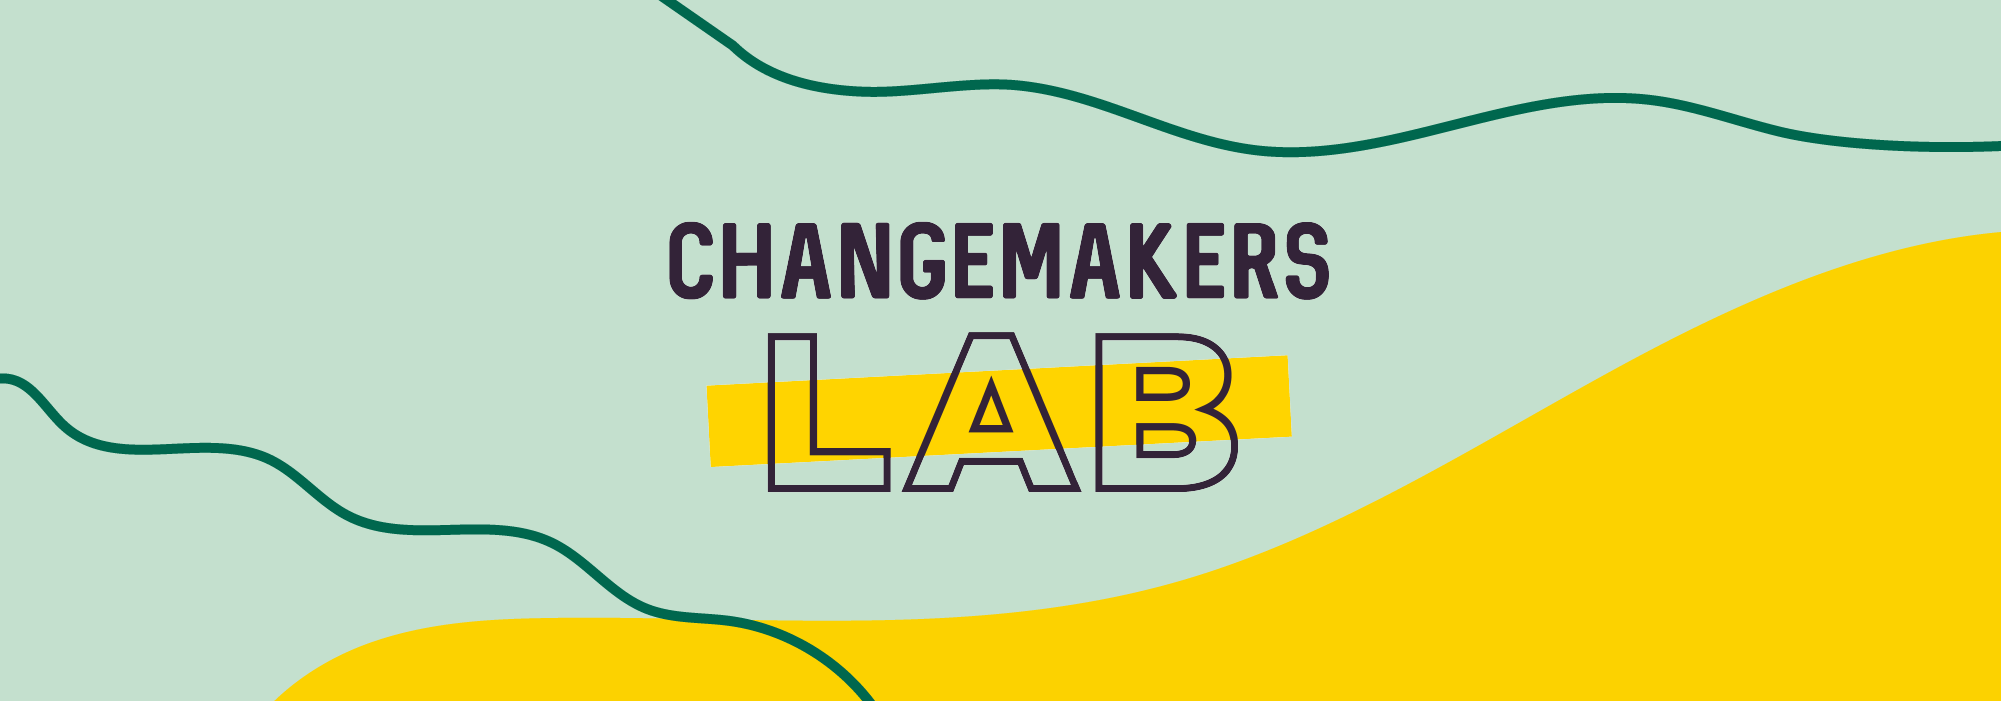 Changemakers Lab